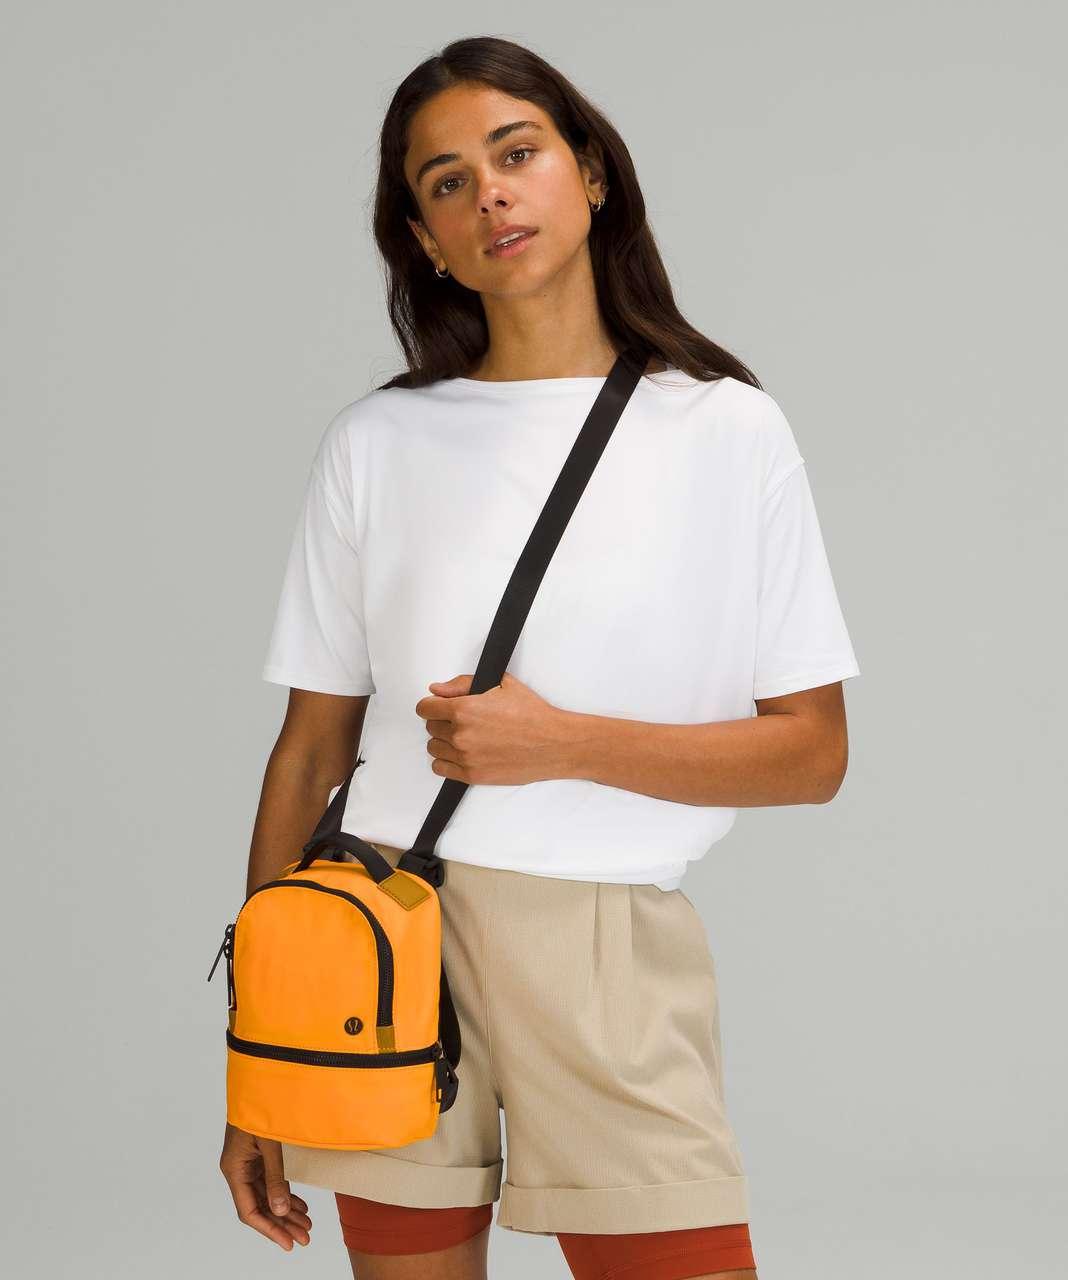 Lululemon City Adventurer Backpack Micro 3L - Clementine